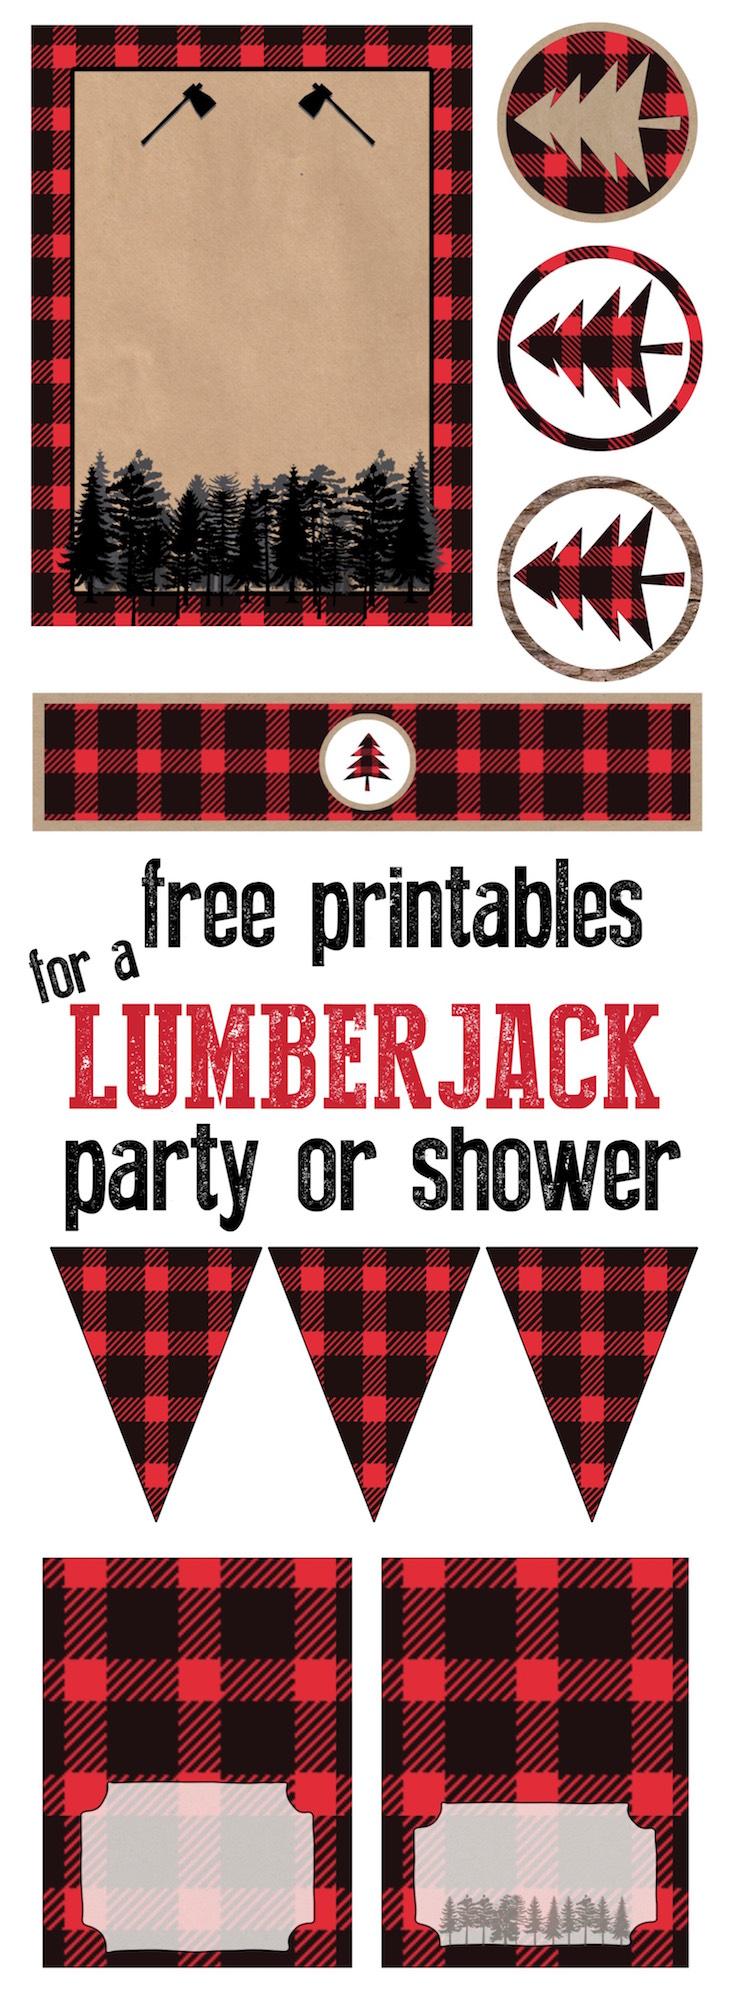 Lumberjack Party Free Printables Paper Trail Design